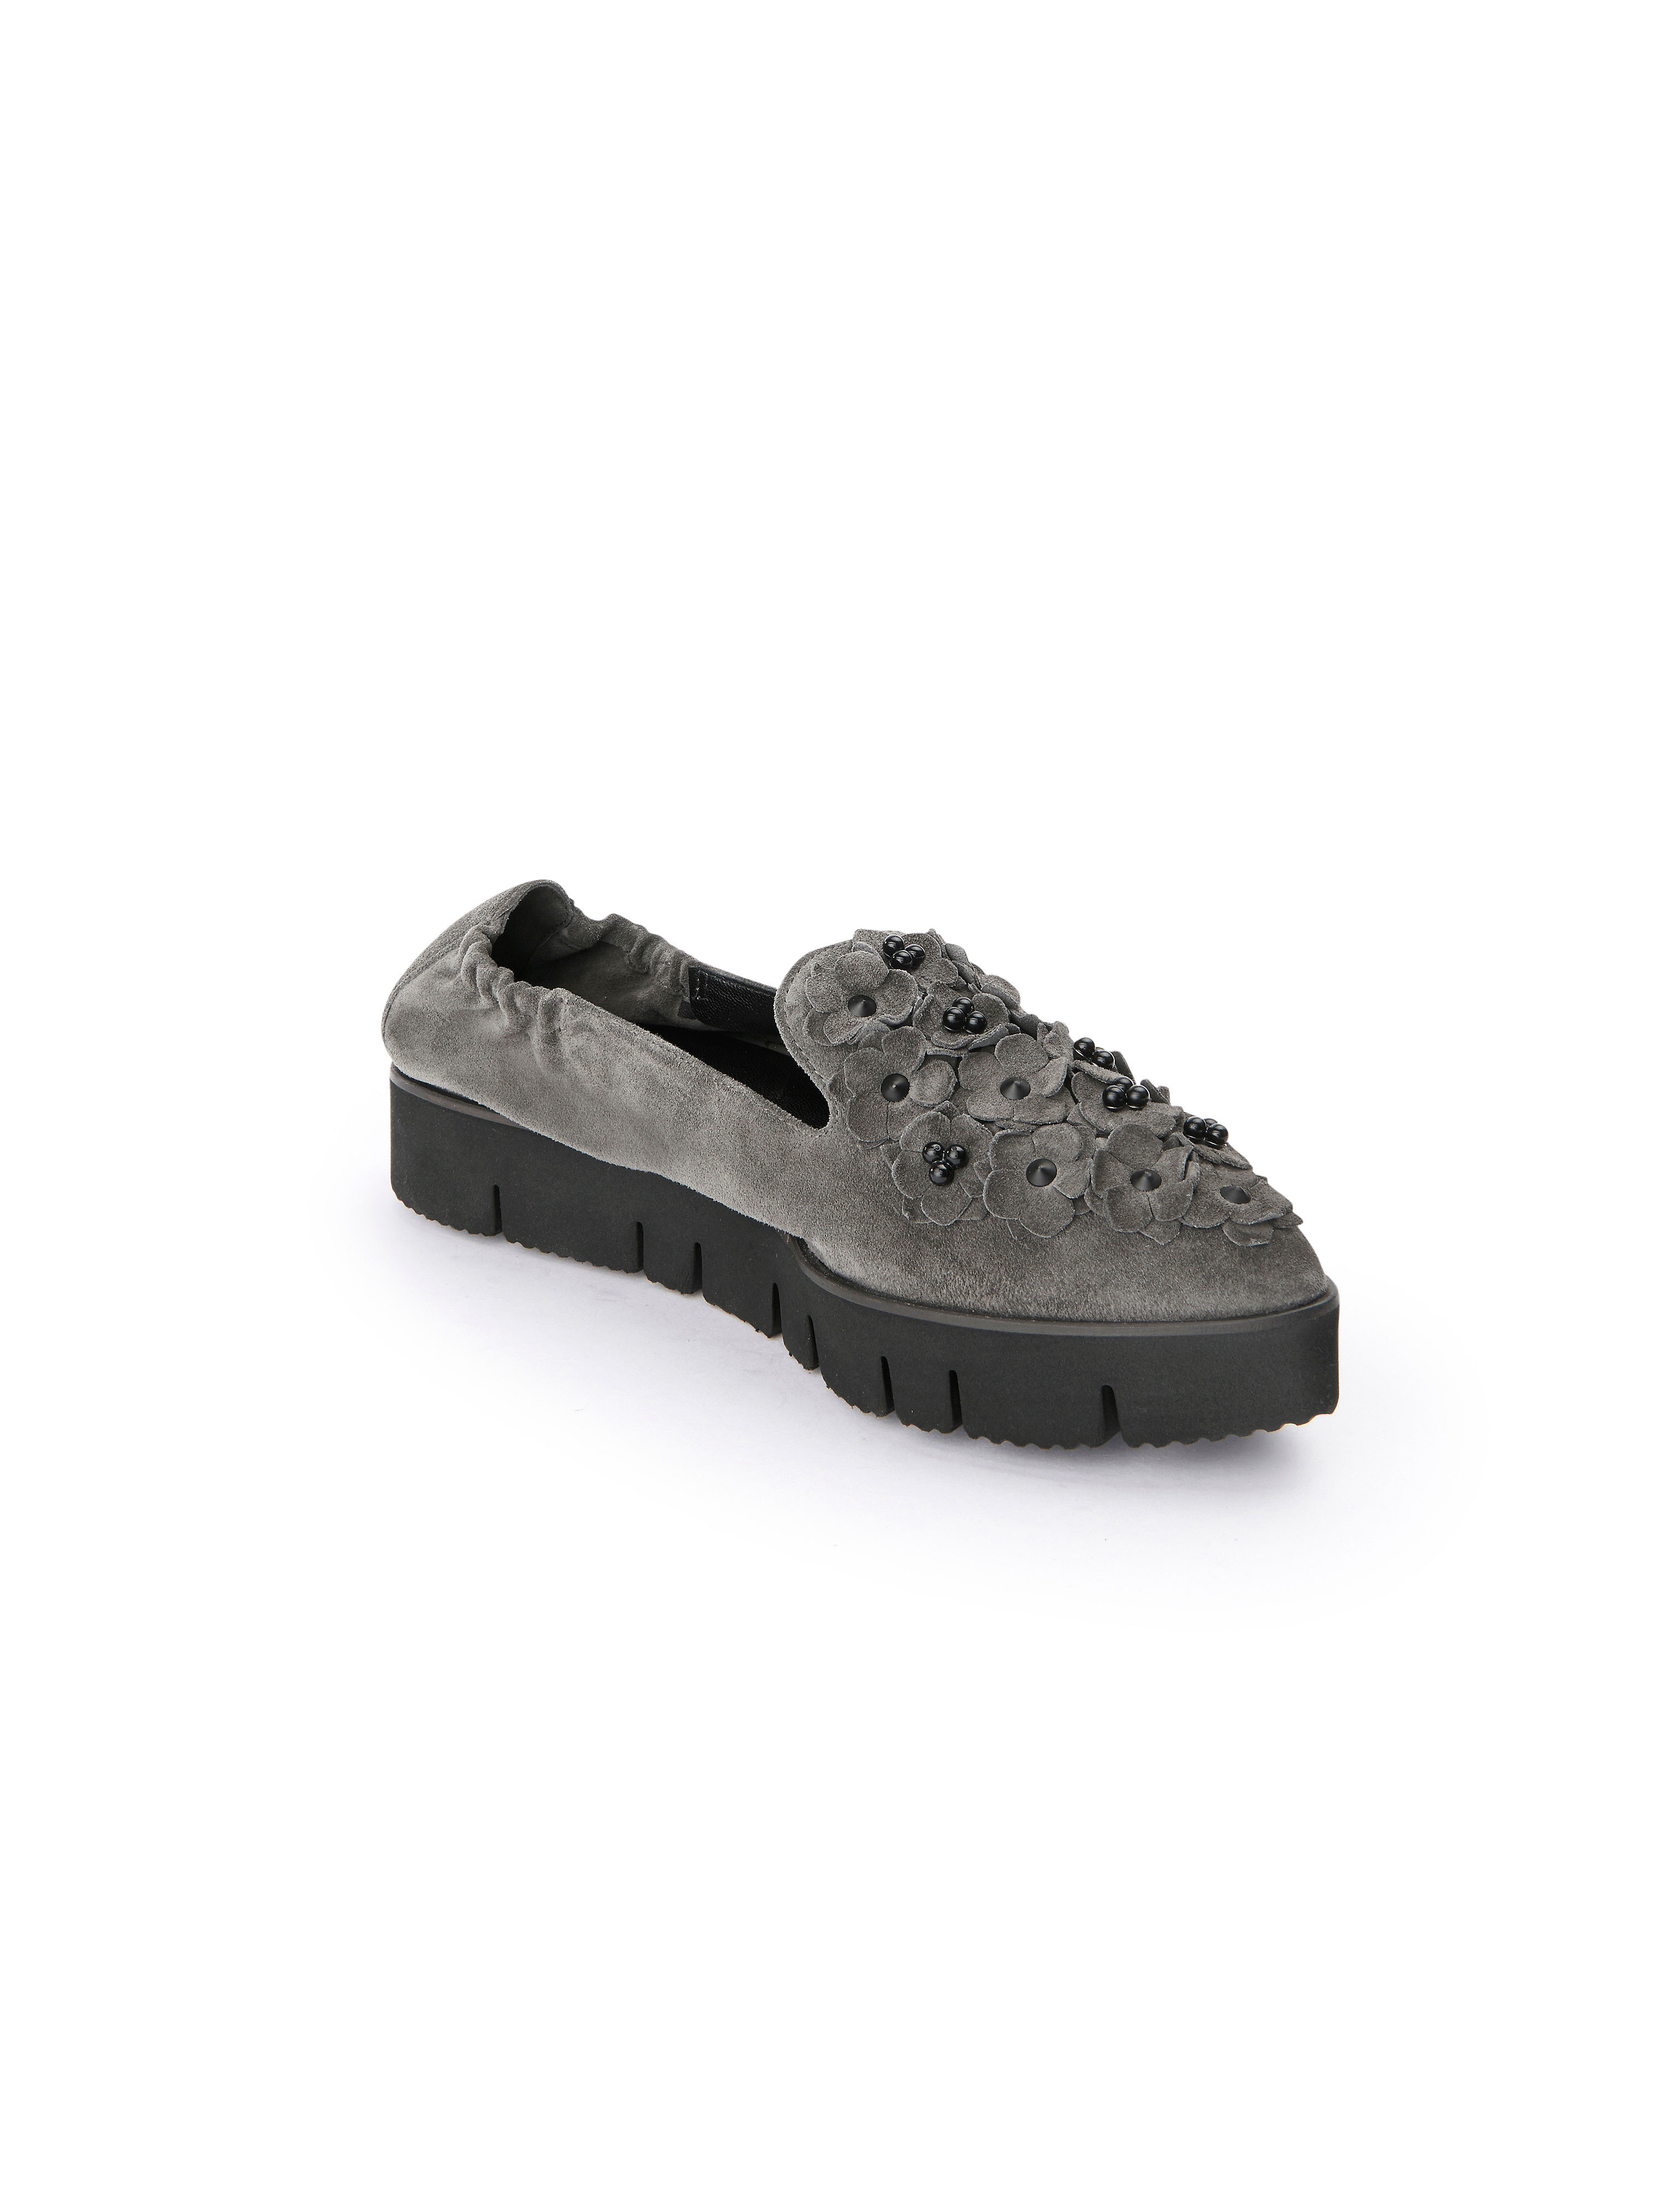 Kennel & Schmenger - Plateau-Slipper PIA XXL - Steingrau Gute Qualität beliebte Schuhe